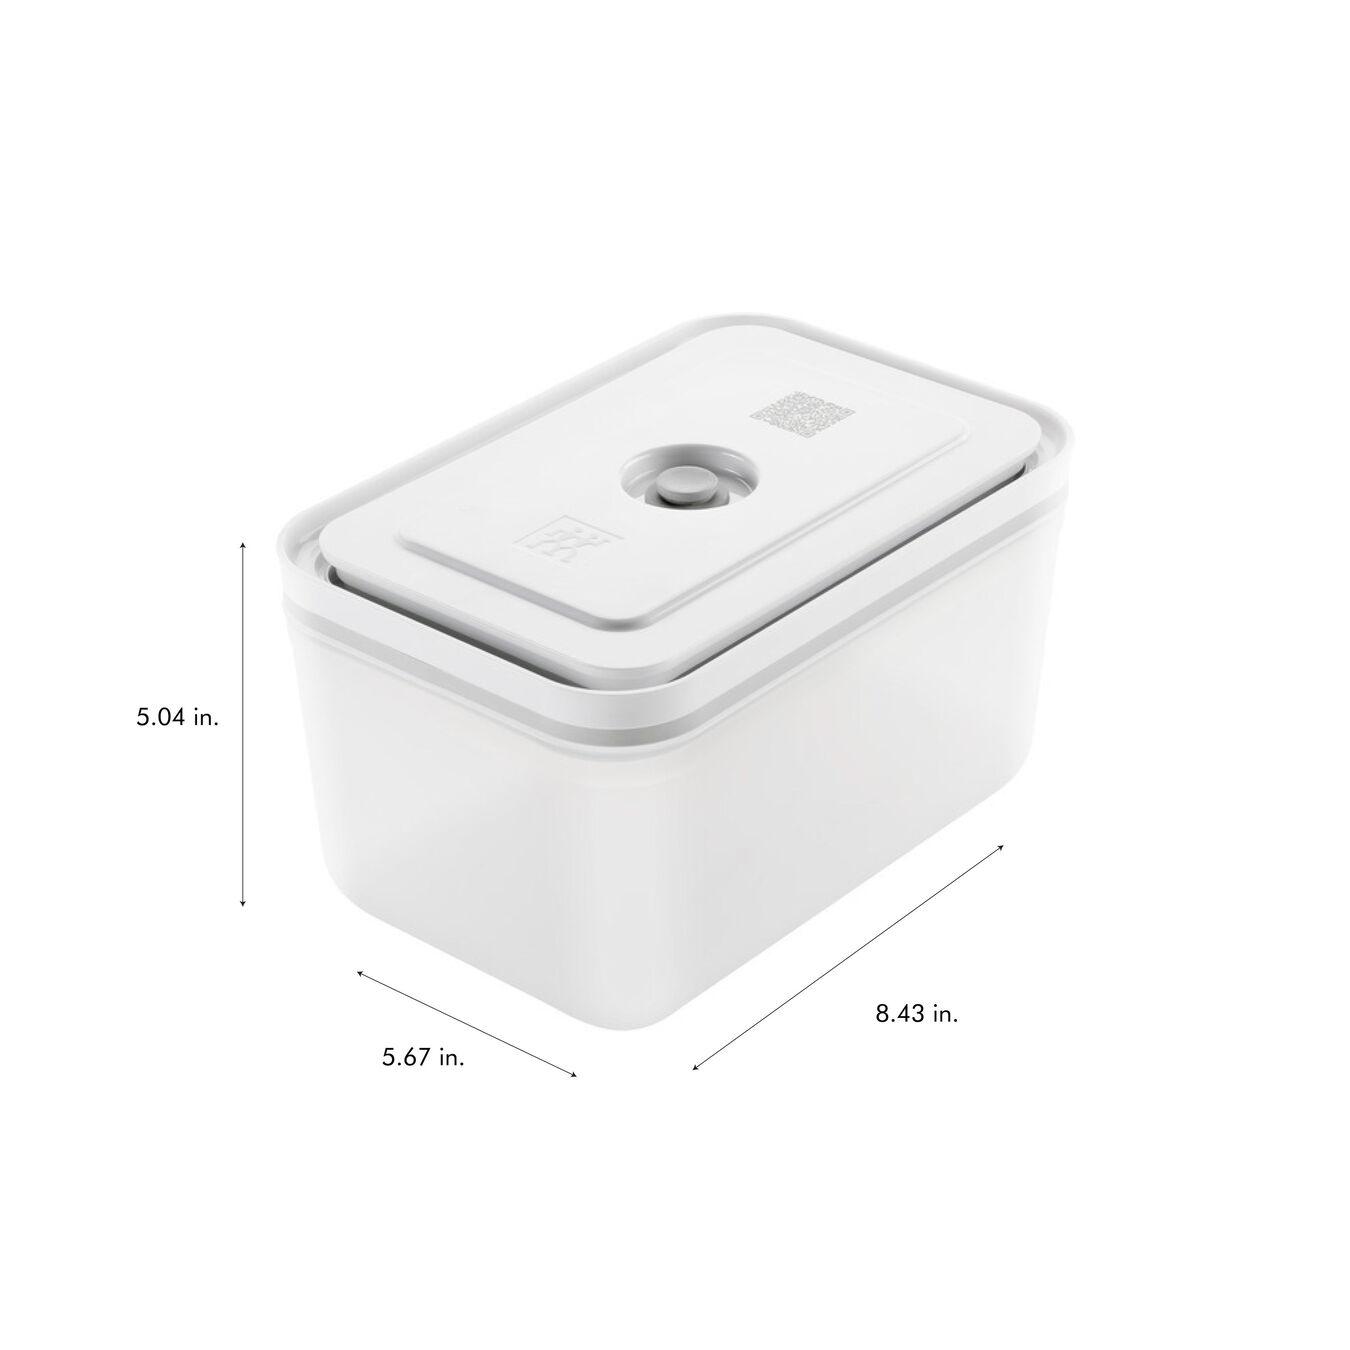 Vacuum starter set, 7-pc, Plastic, White,,large 15